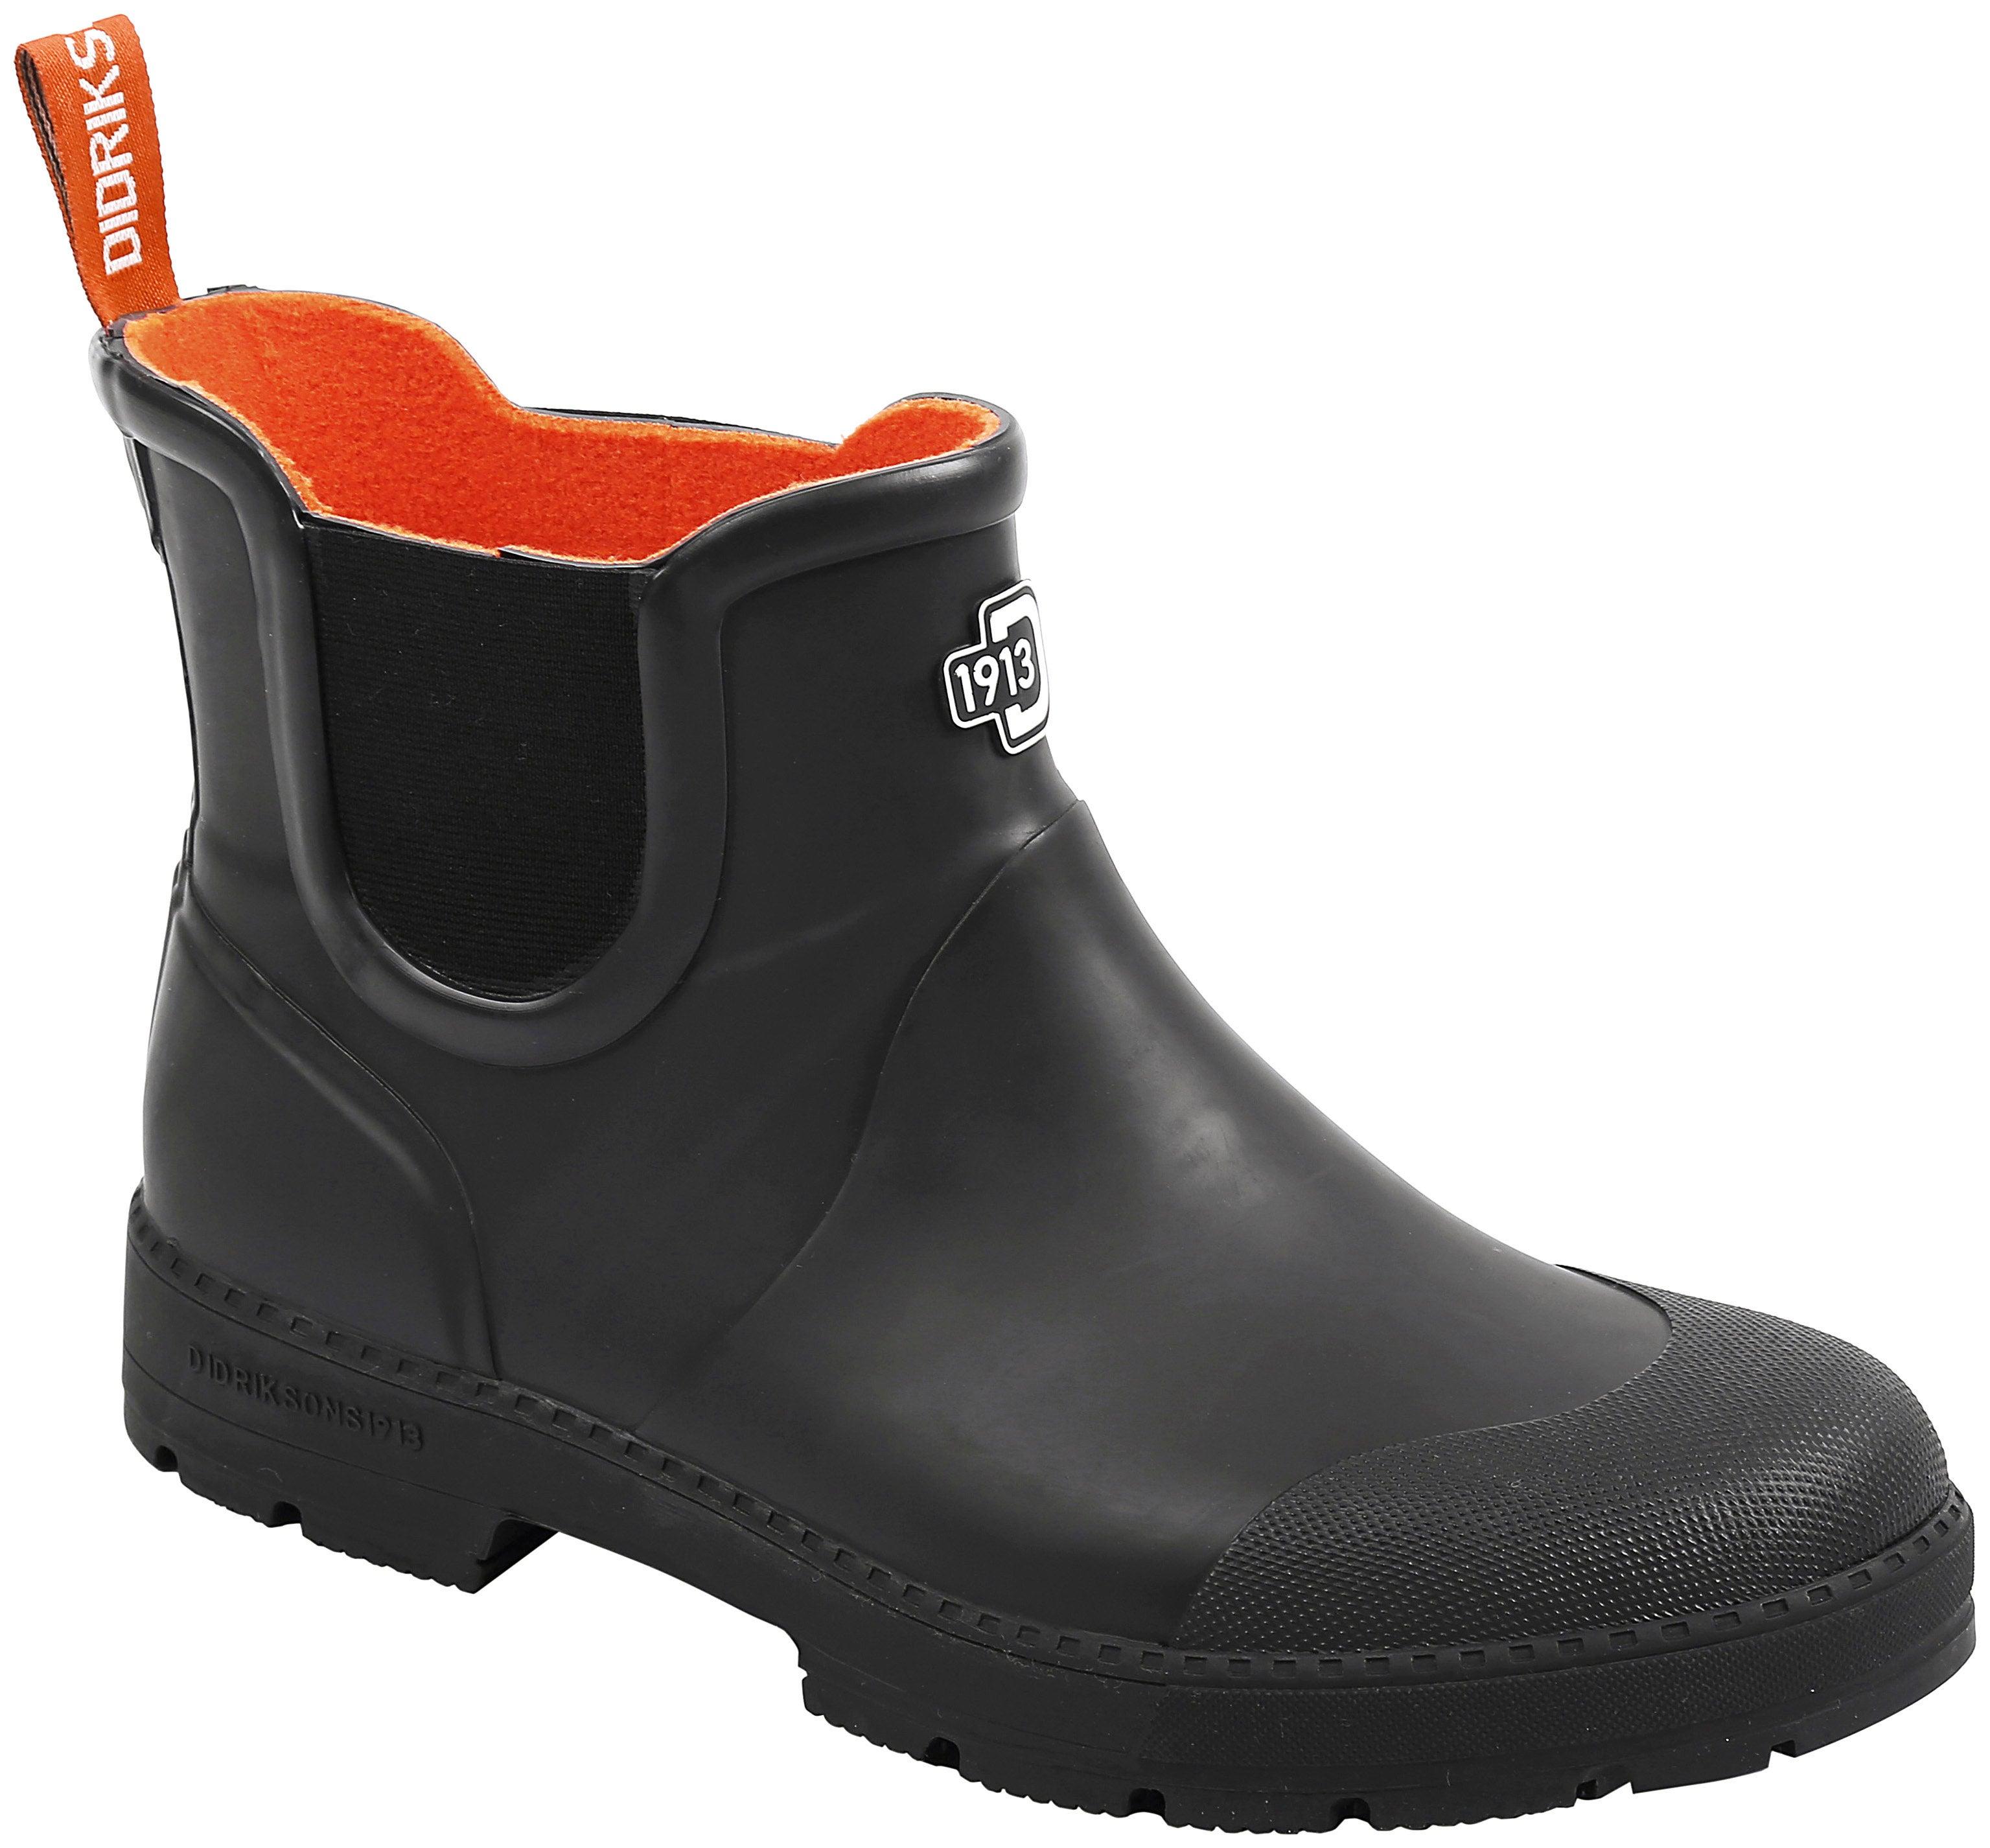 vinga women 39 s rubber boots didriksons. Black Bedroom Furniture Sets. Home Design Ideas